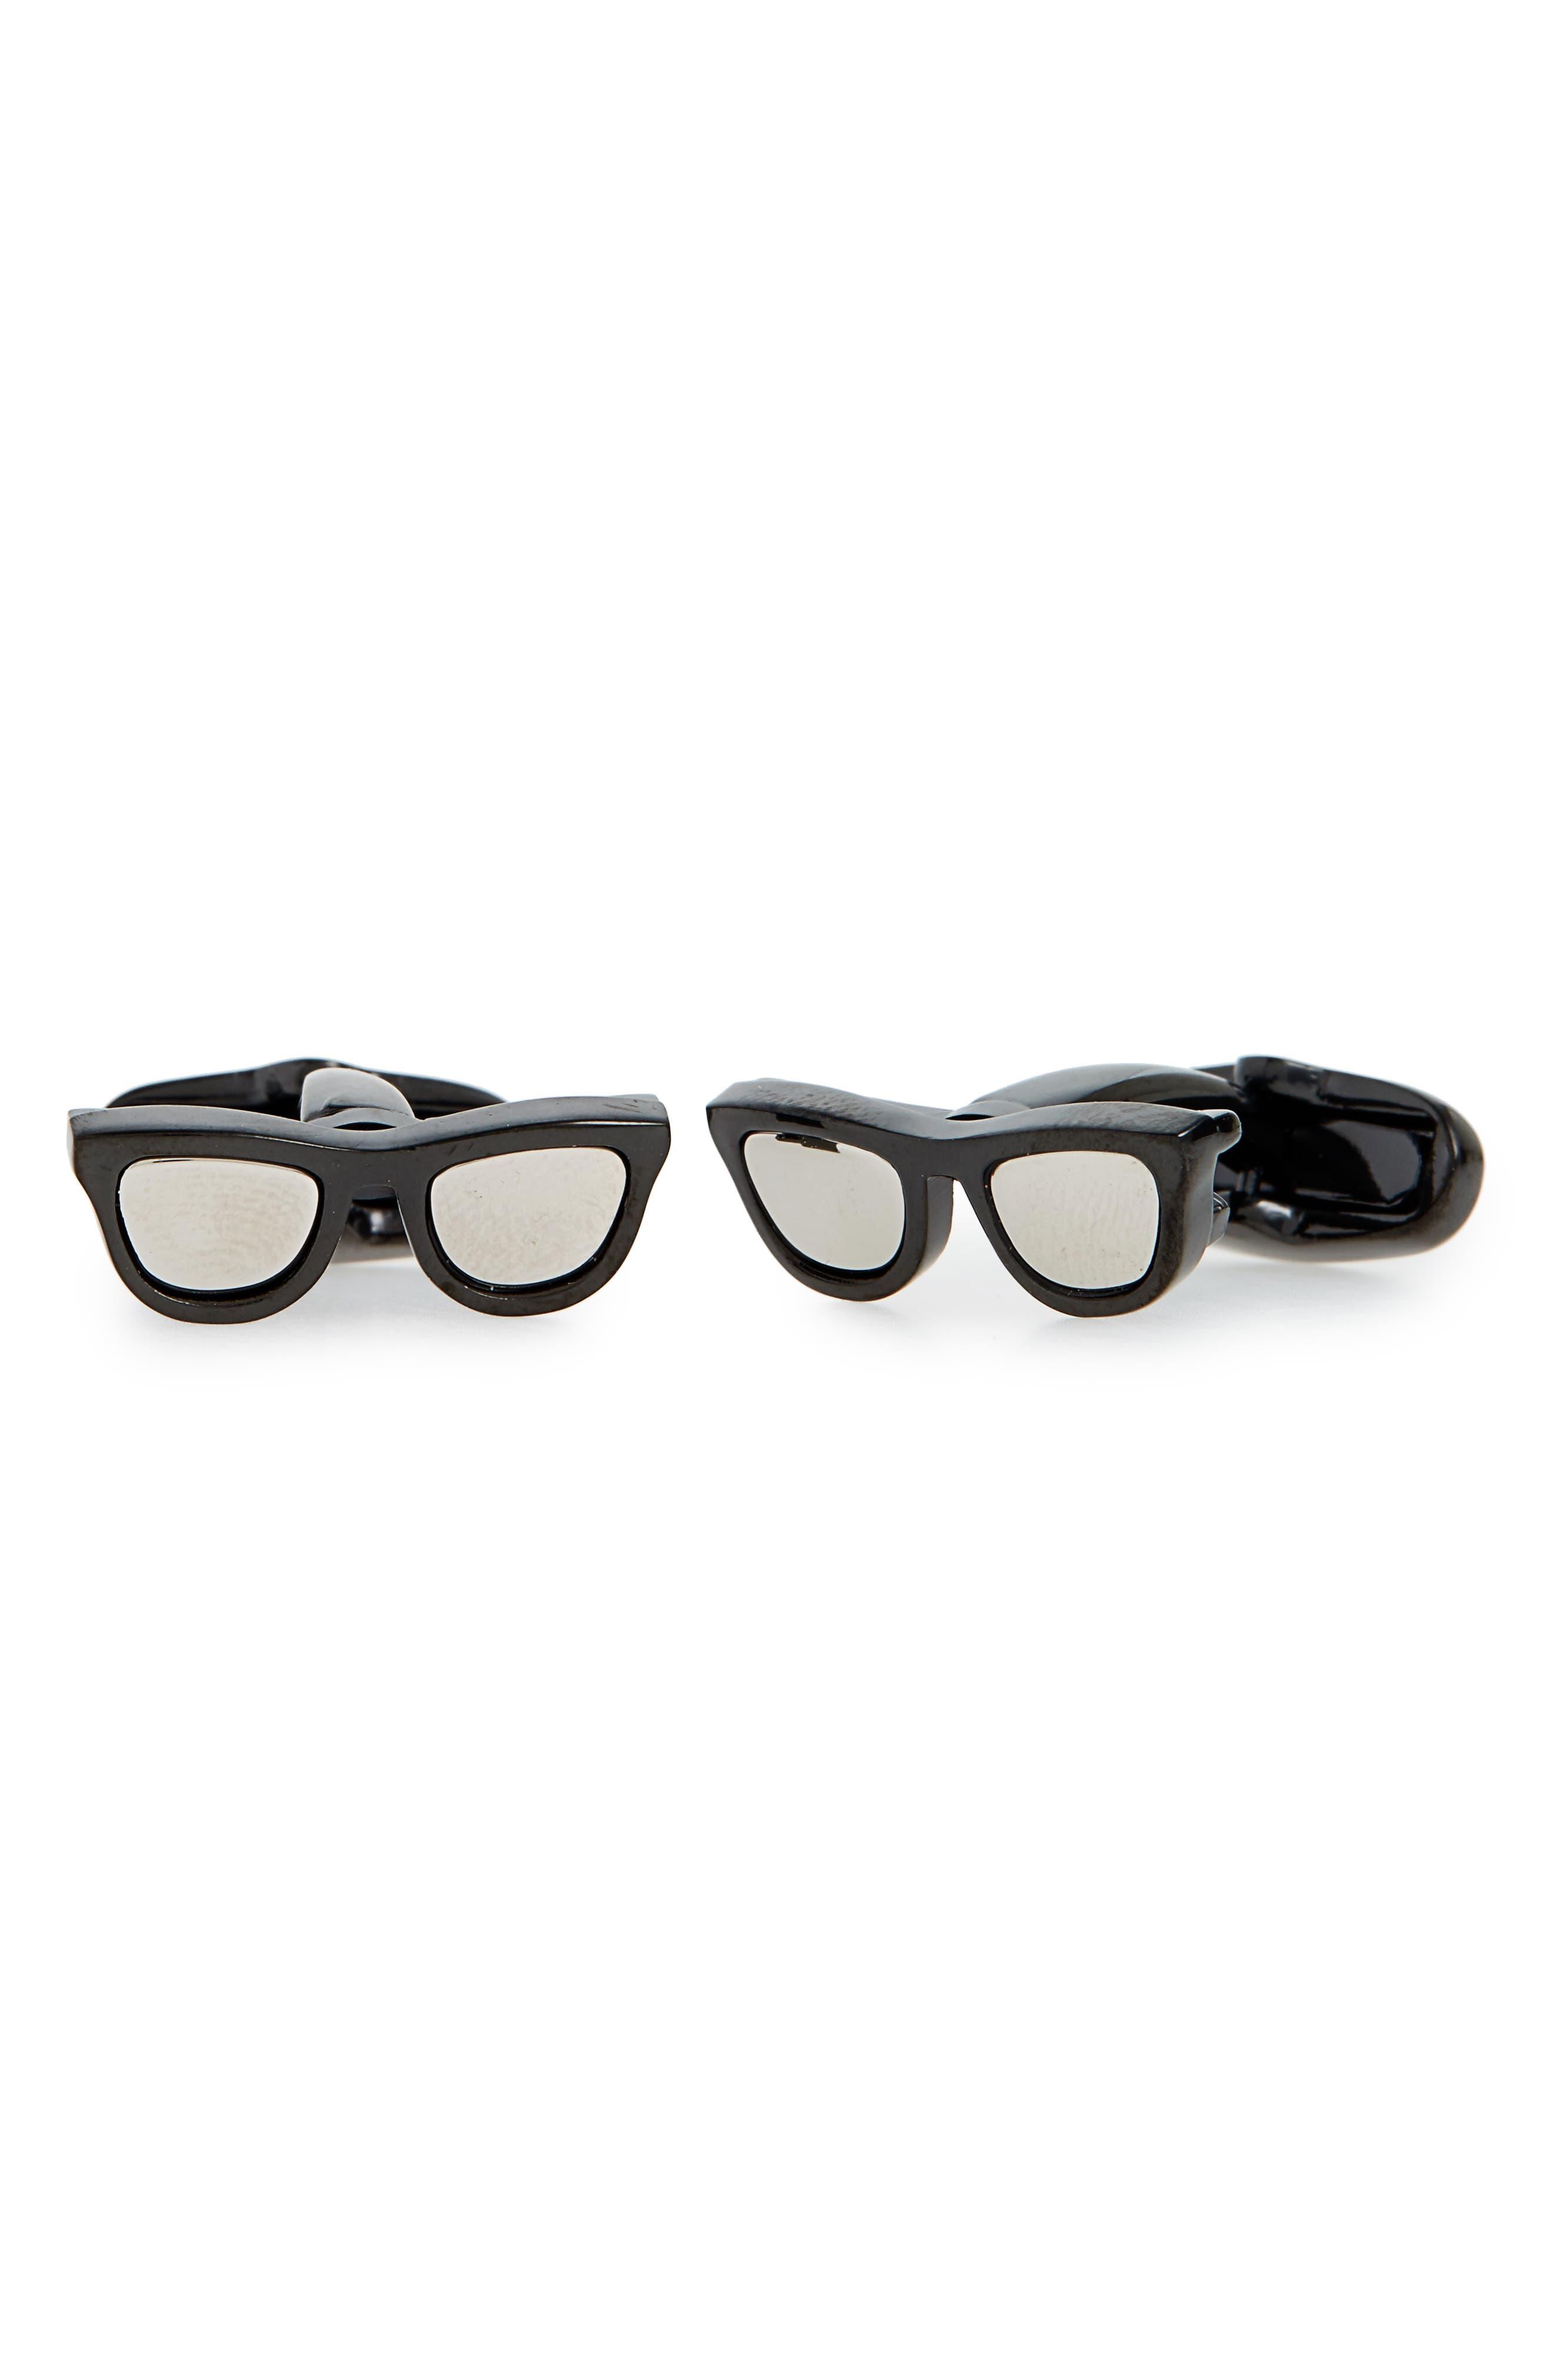 Main Image - Paul Smith Sunglasses Cuff Links